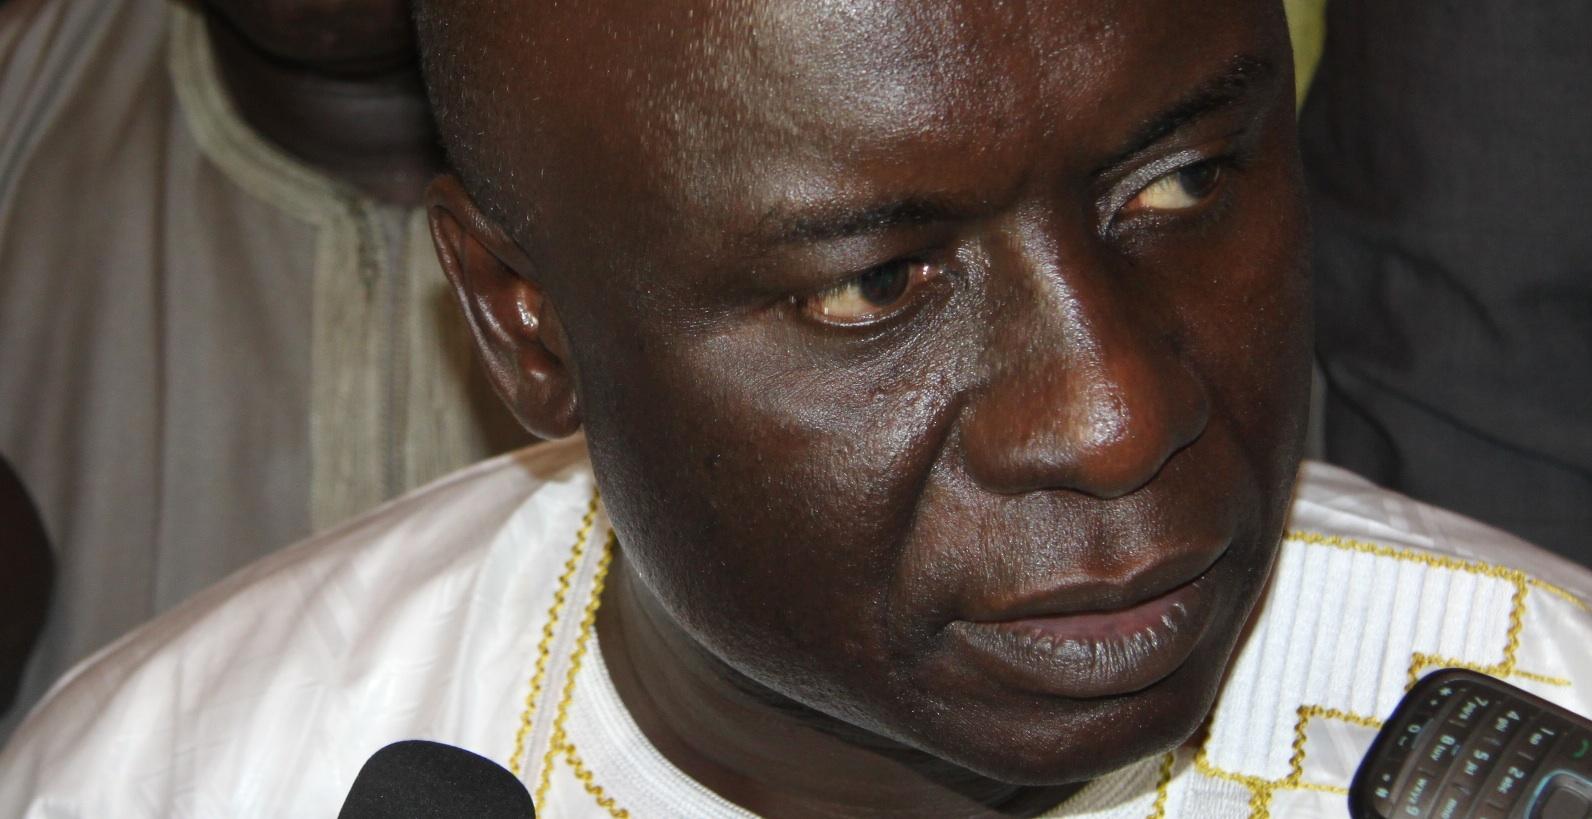 Idrissa Echecs : « Ku woddoo lamin, boo noppé, rafflé ! ». Par Mamadou Thiam.